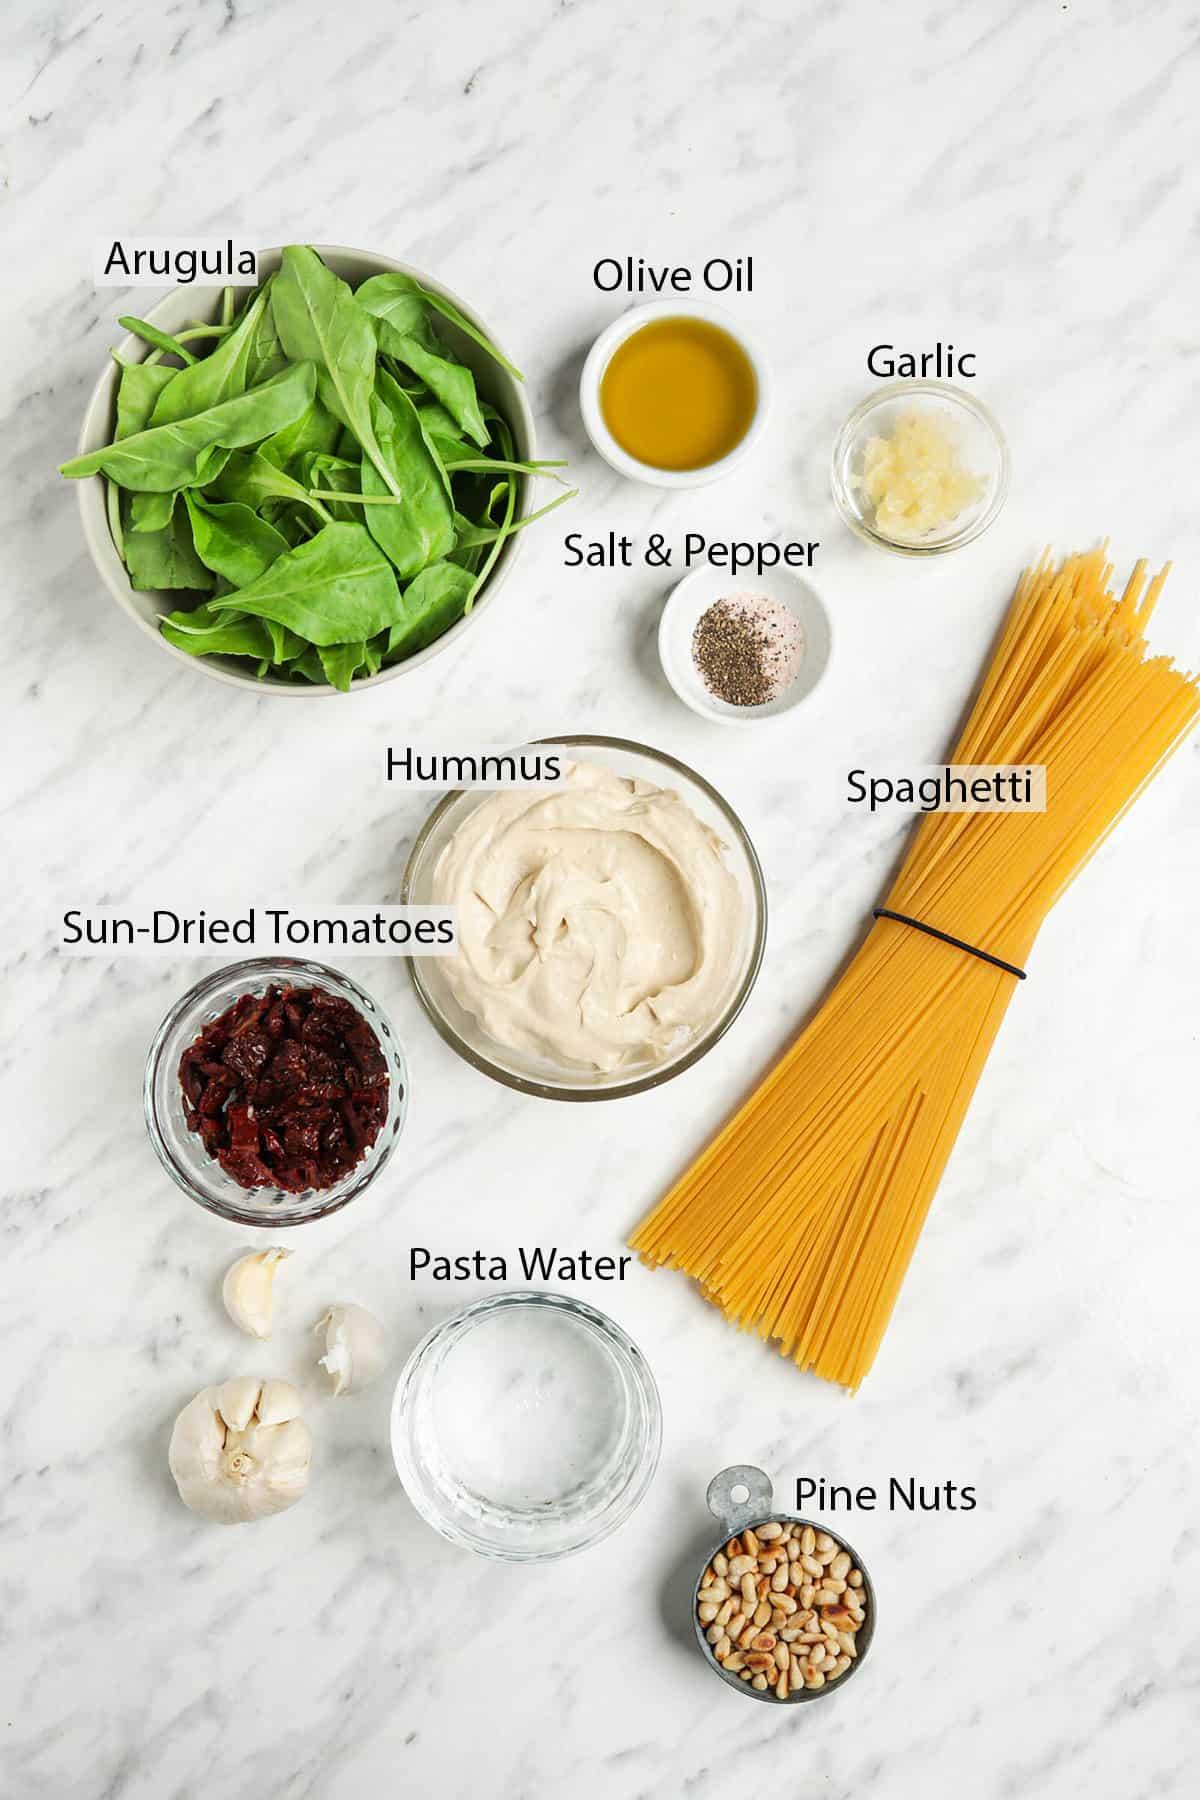 hummus, arugula, salt, pepper, spaghetti, sun-dried tomatoes, pasta water, garlic, olive oil, pine nuts